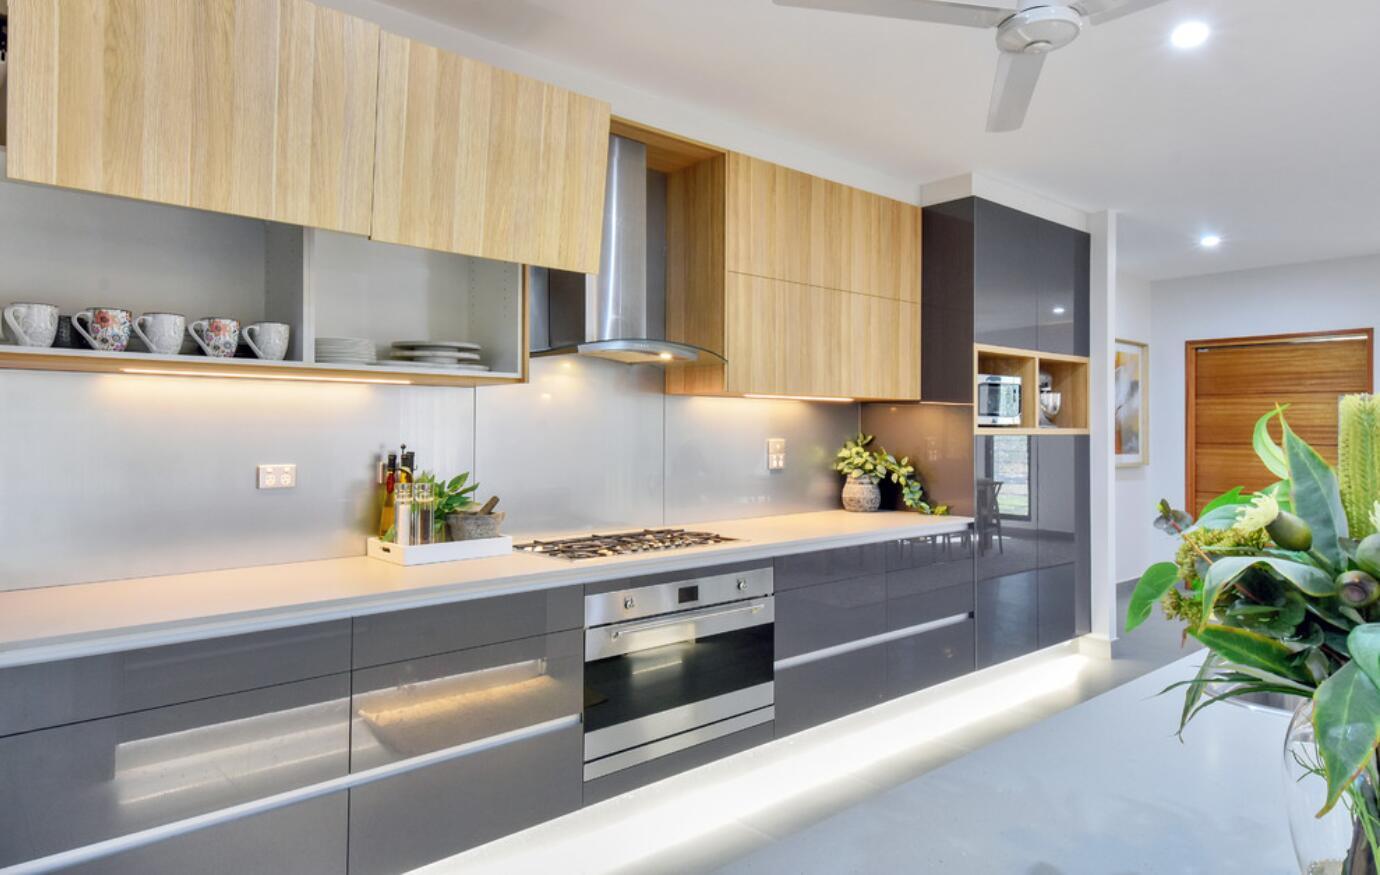 AisDecor painting laminate kitchen cupboards overseas trader-1